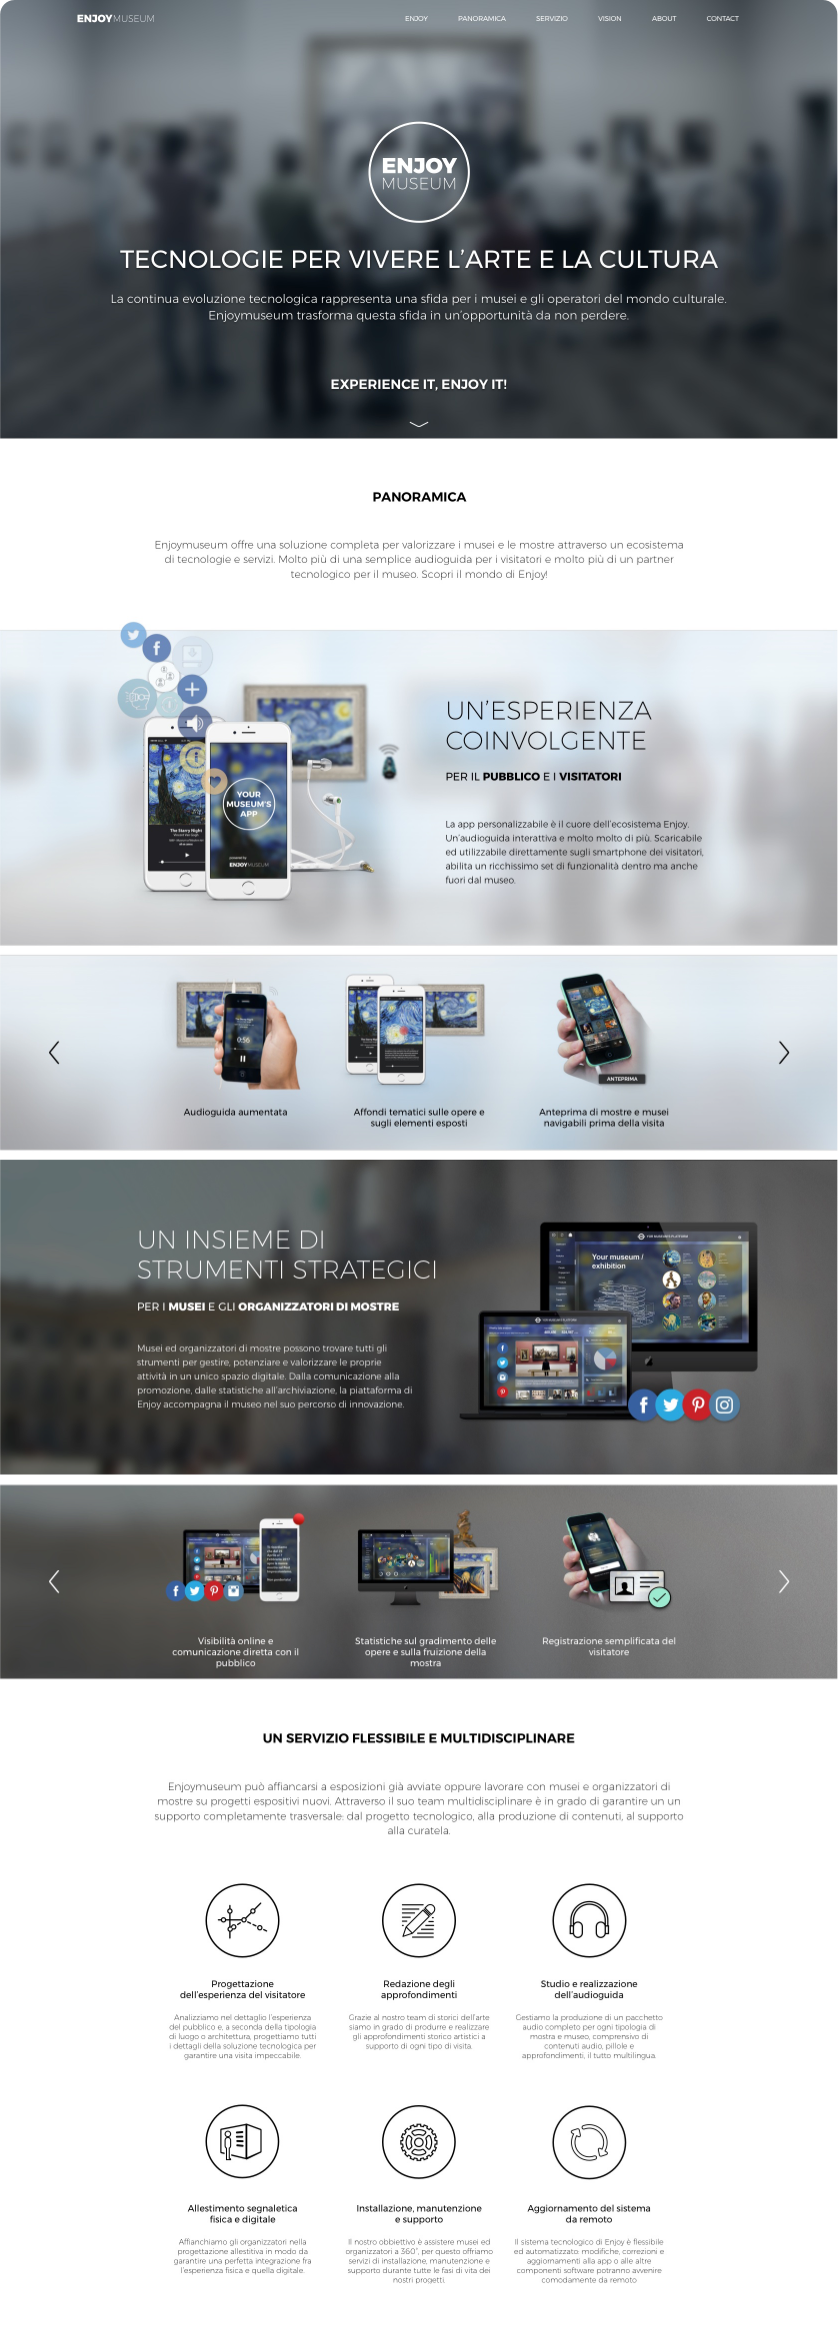 Enjoymuseum. Museum experience design by Fabio Besti - The Website Homepage long vertical